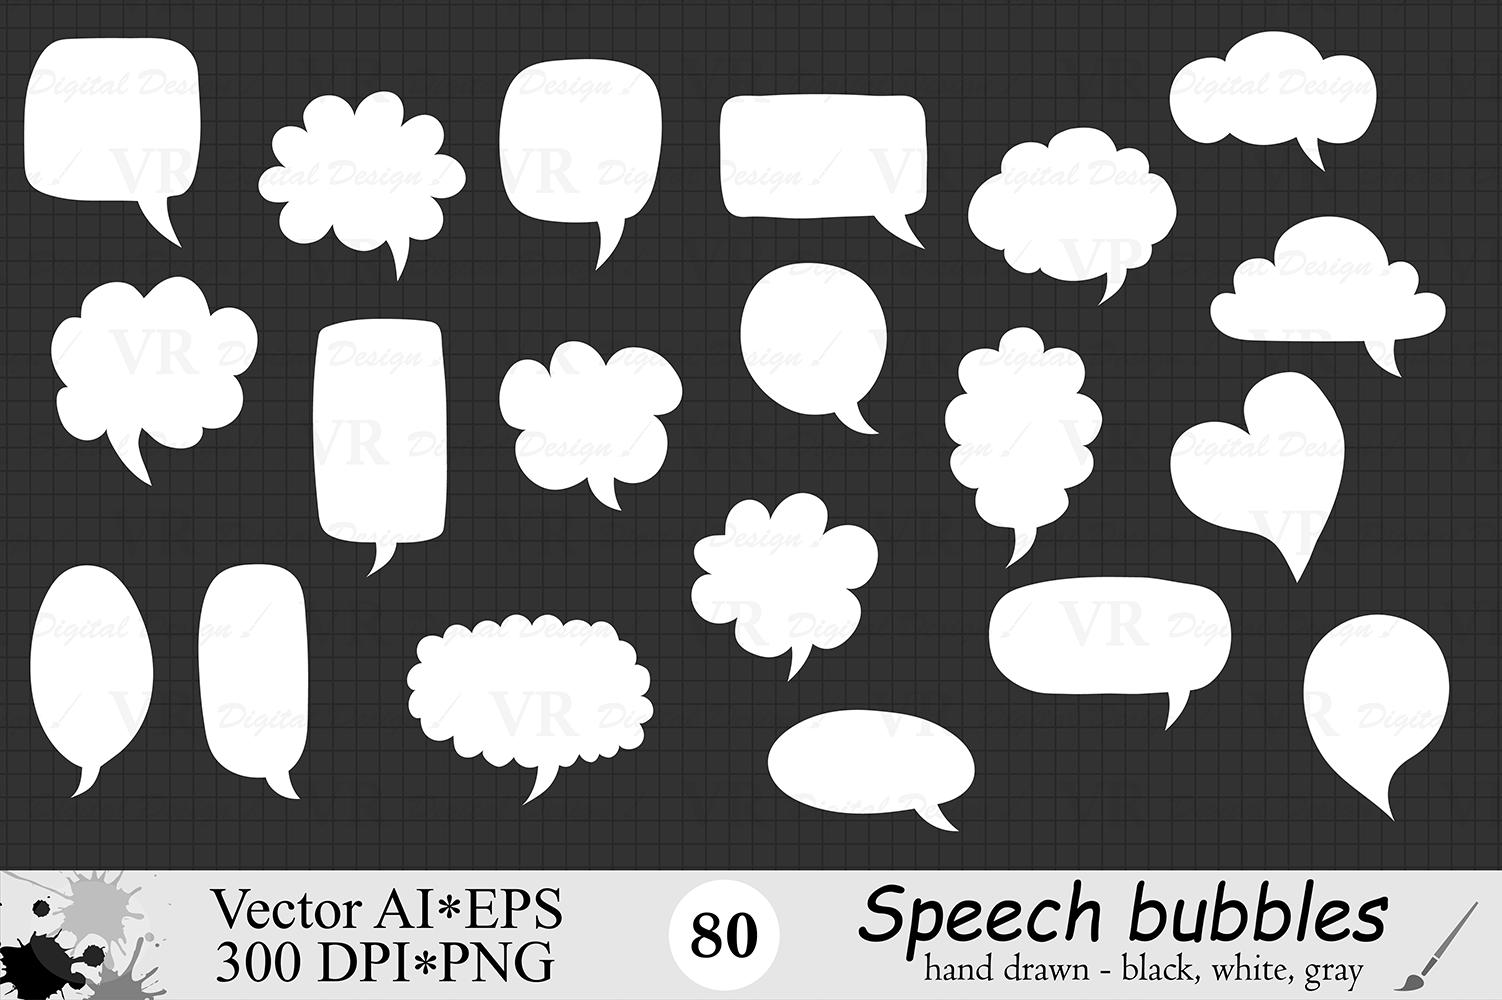 Speech Bubbles Clipart / Chat Bubbles / Hand drawn Text bubbles / Black, White, Gray - Vector example image 5